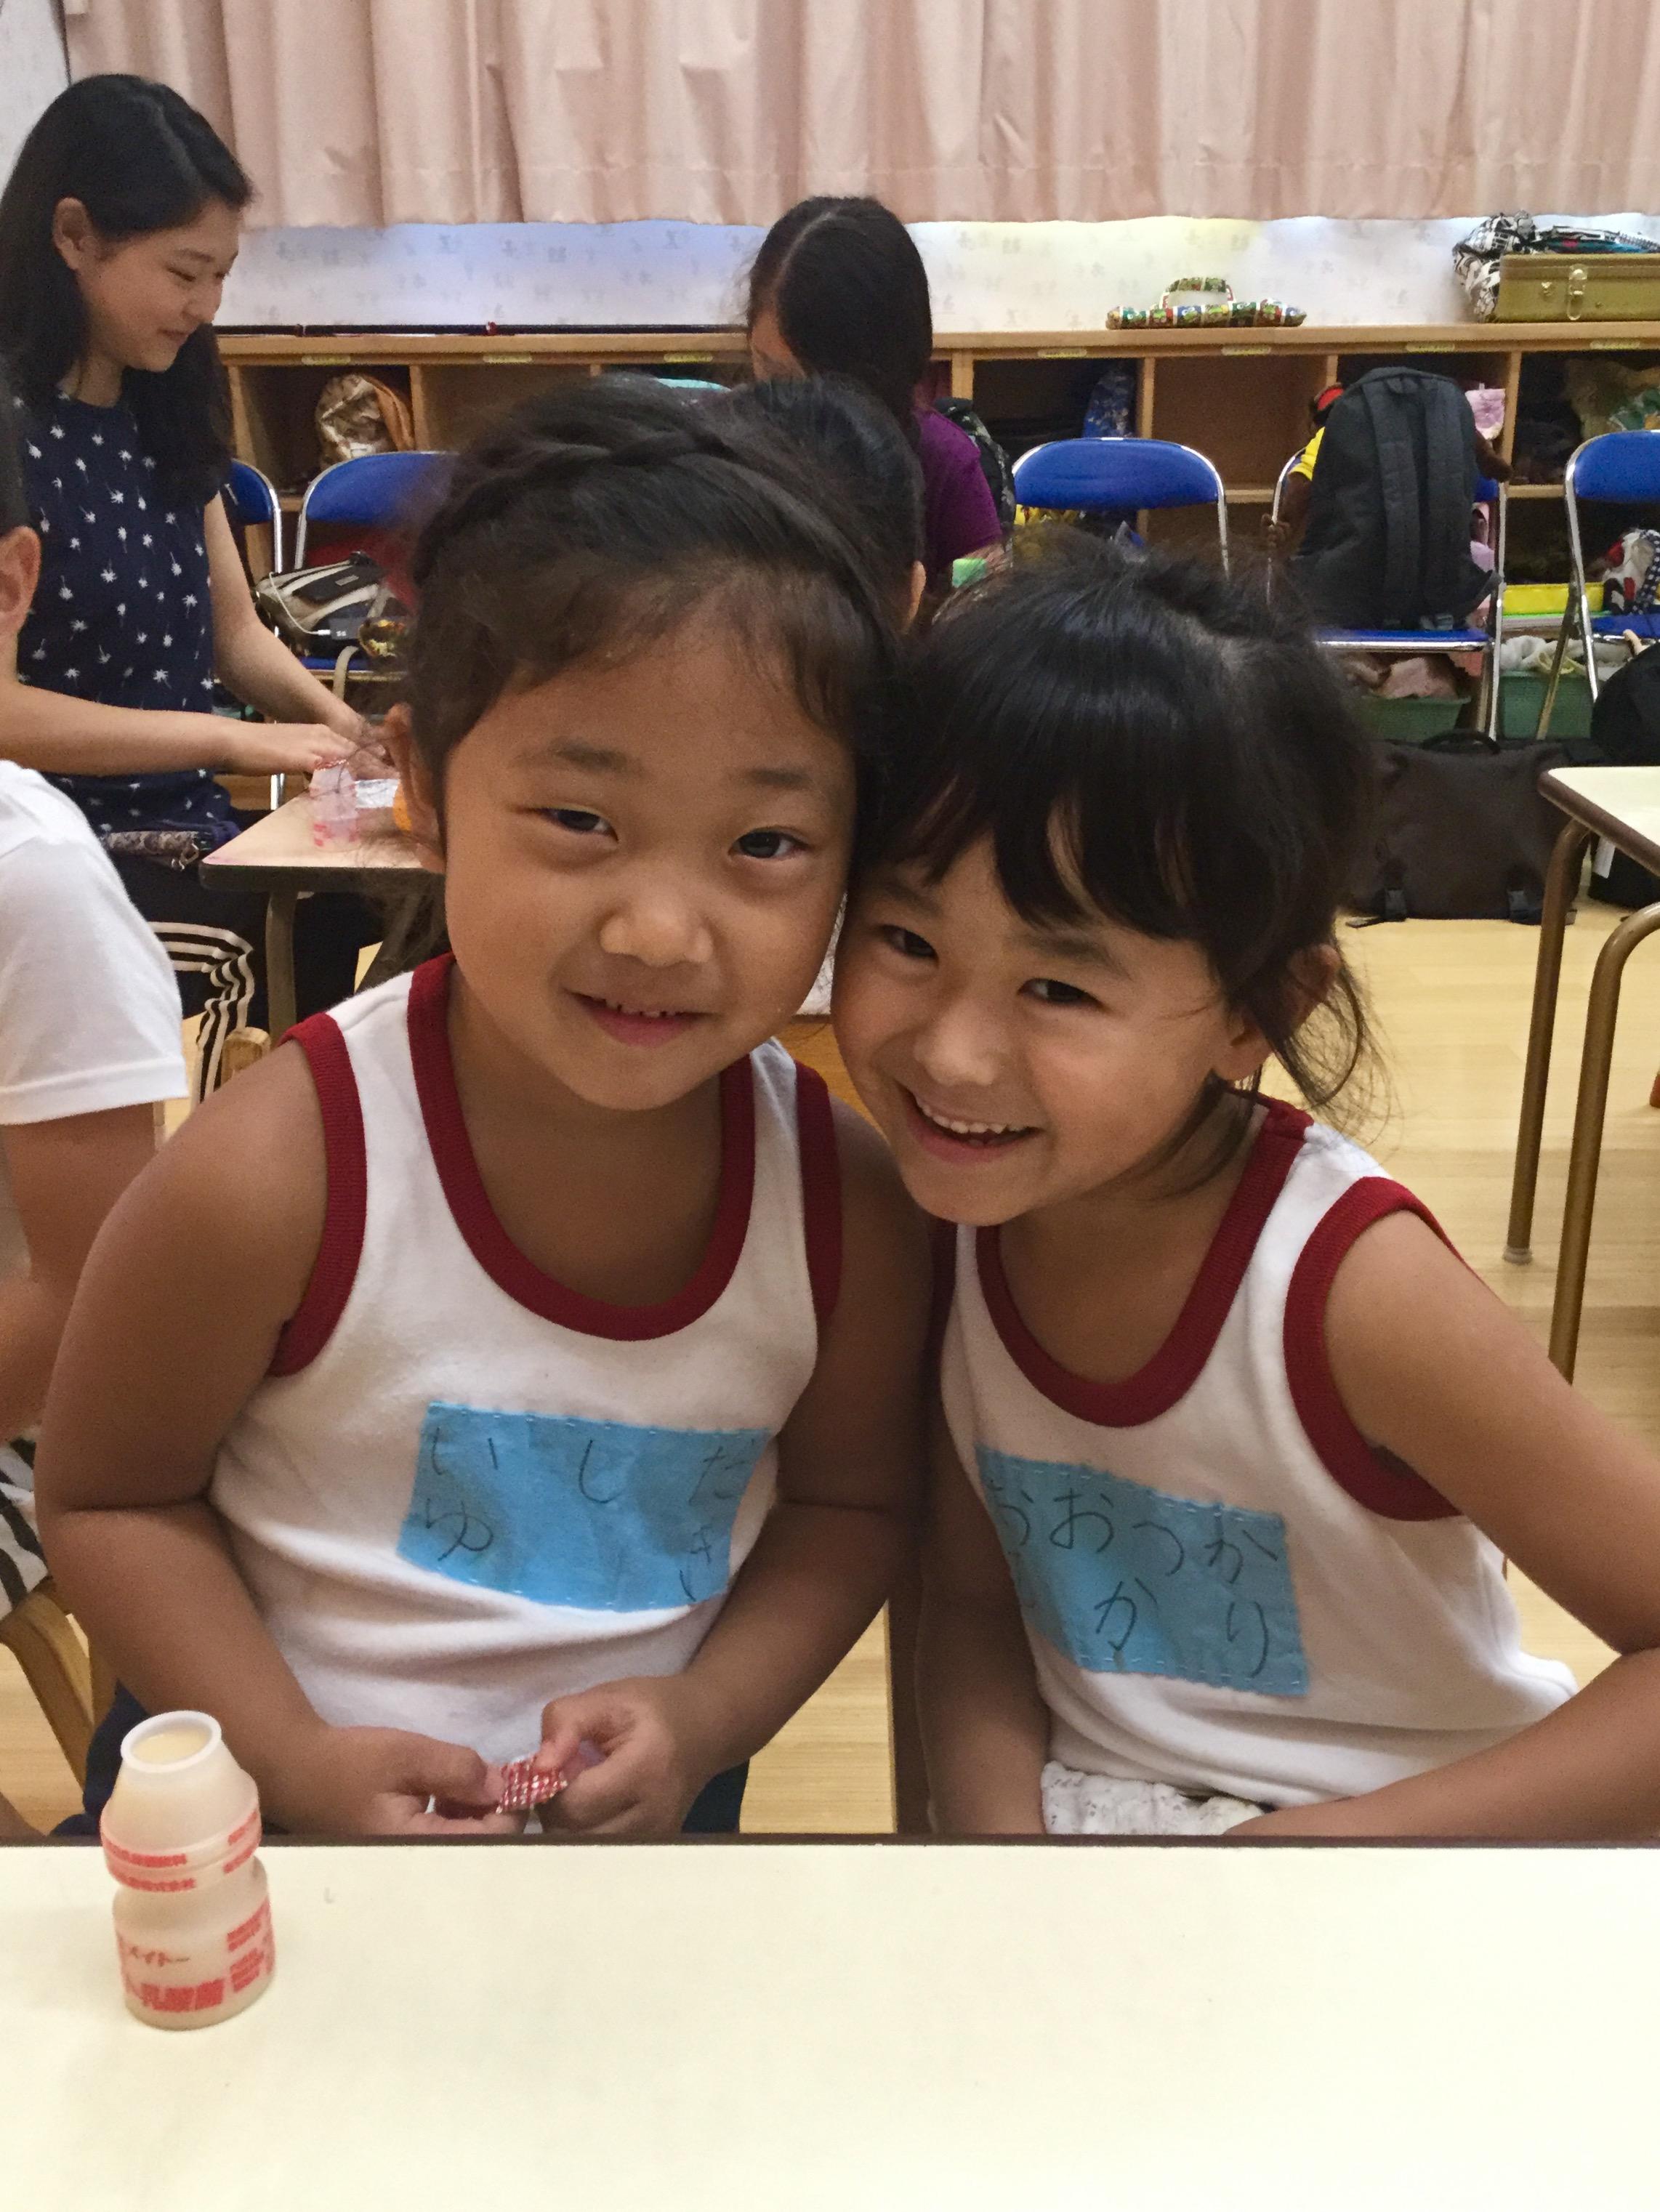 2 little girls.jpg